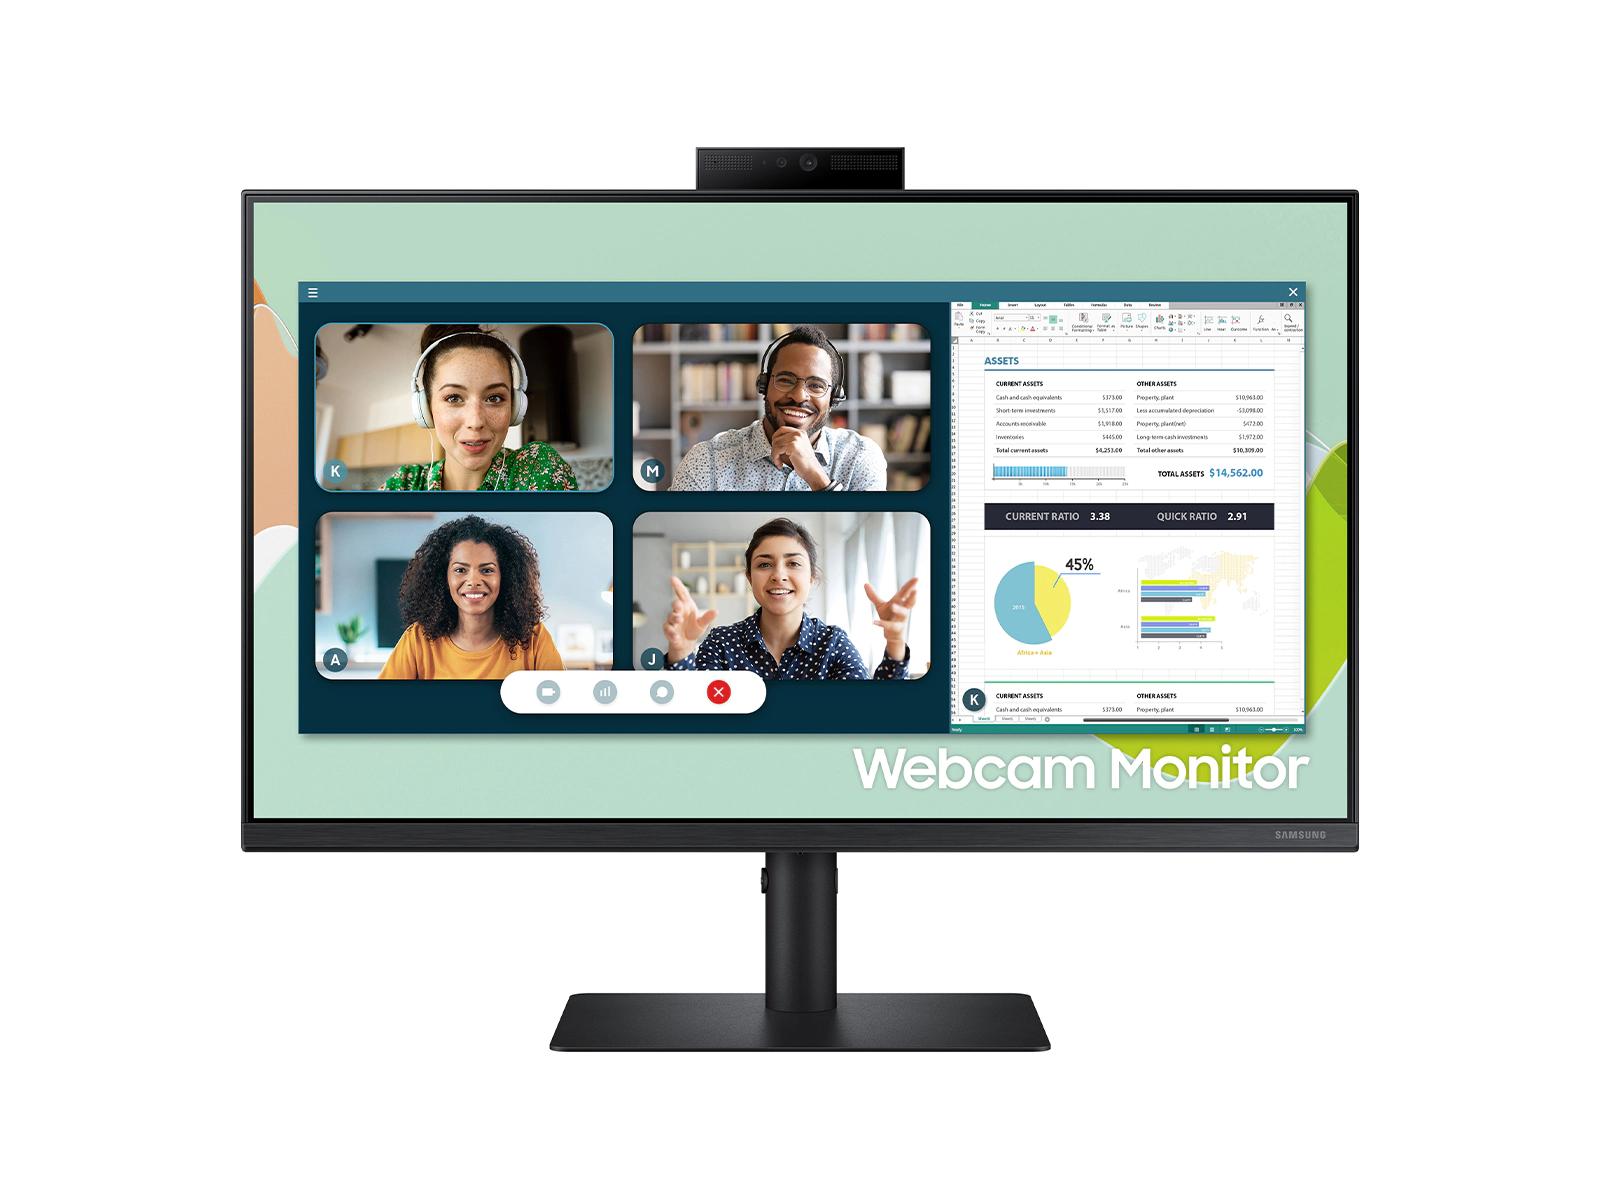 24 Webcam Monitor S4